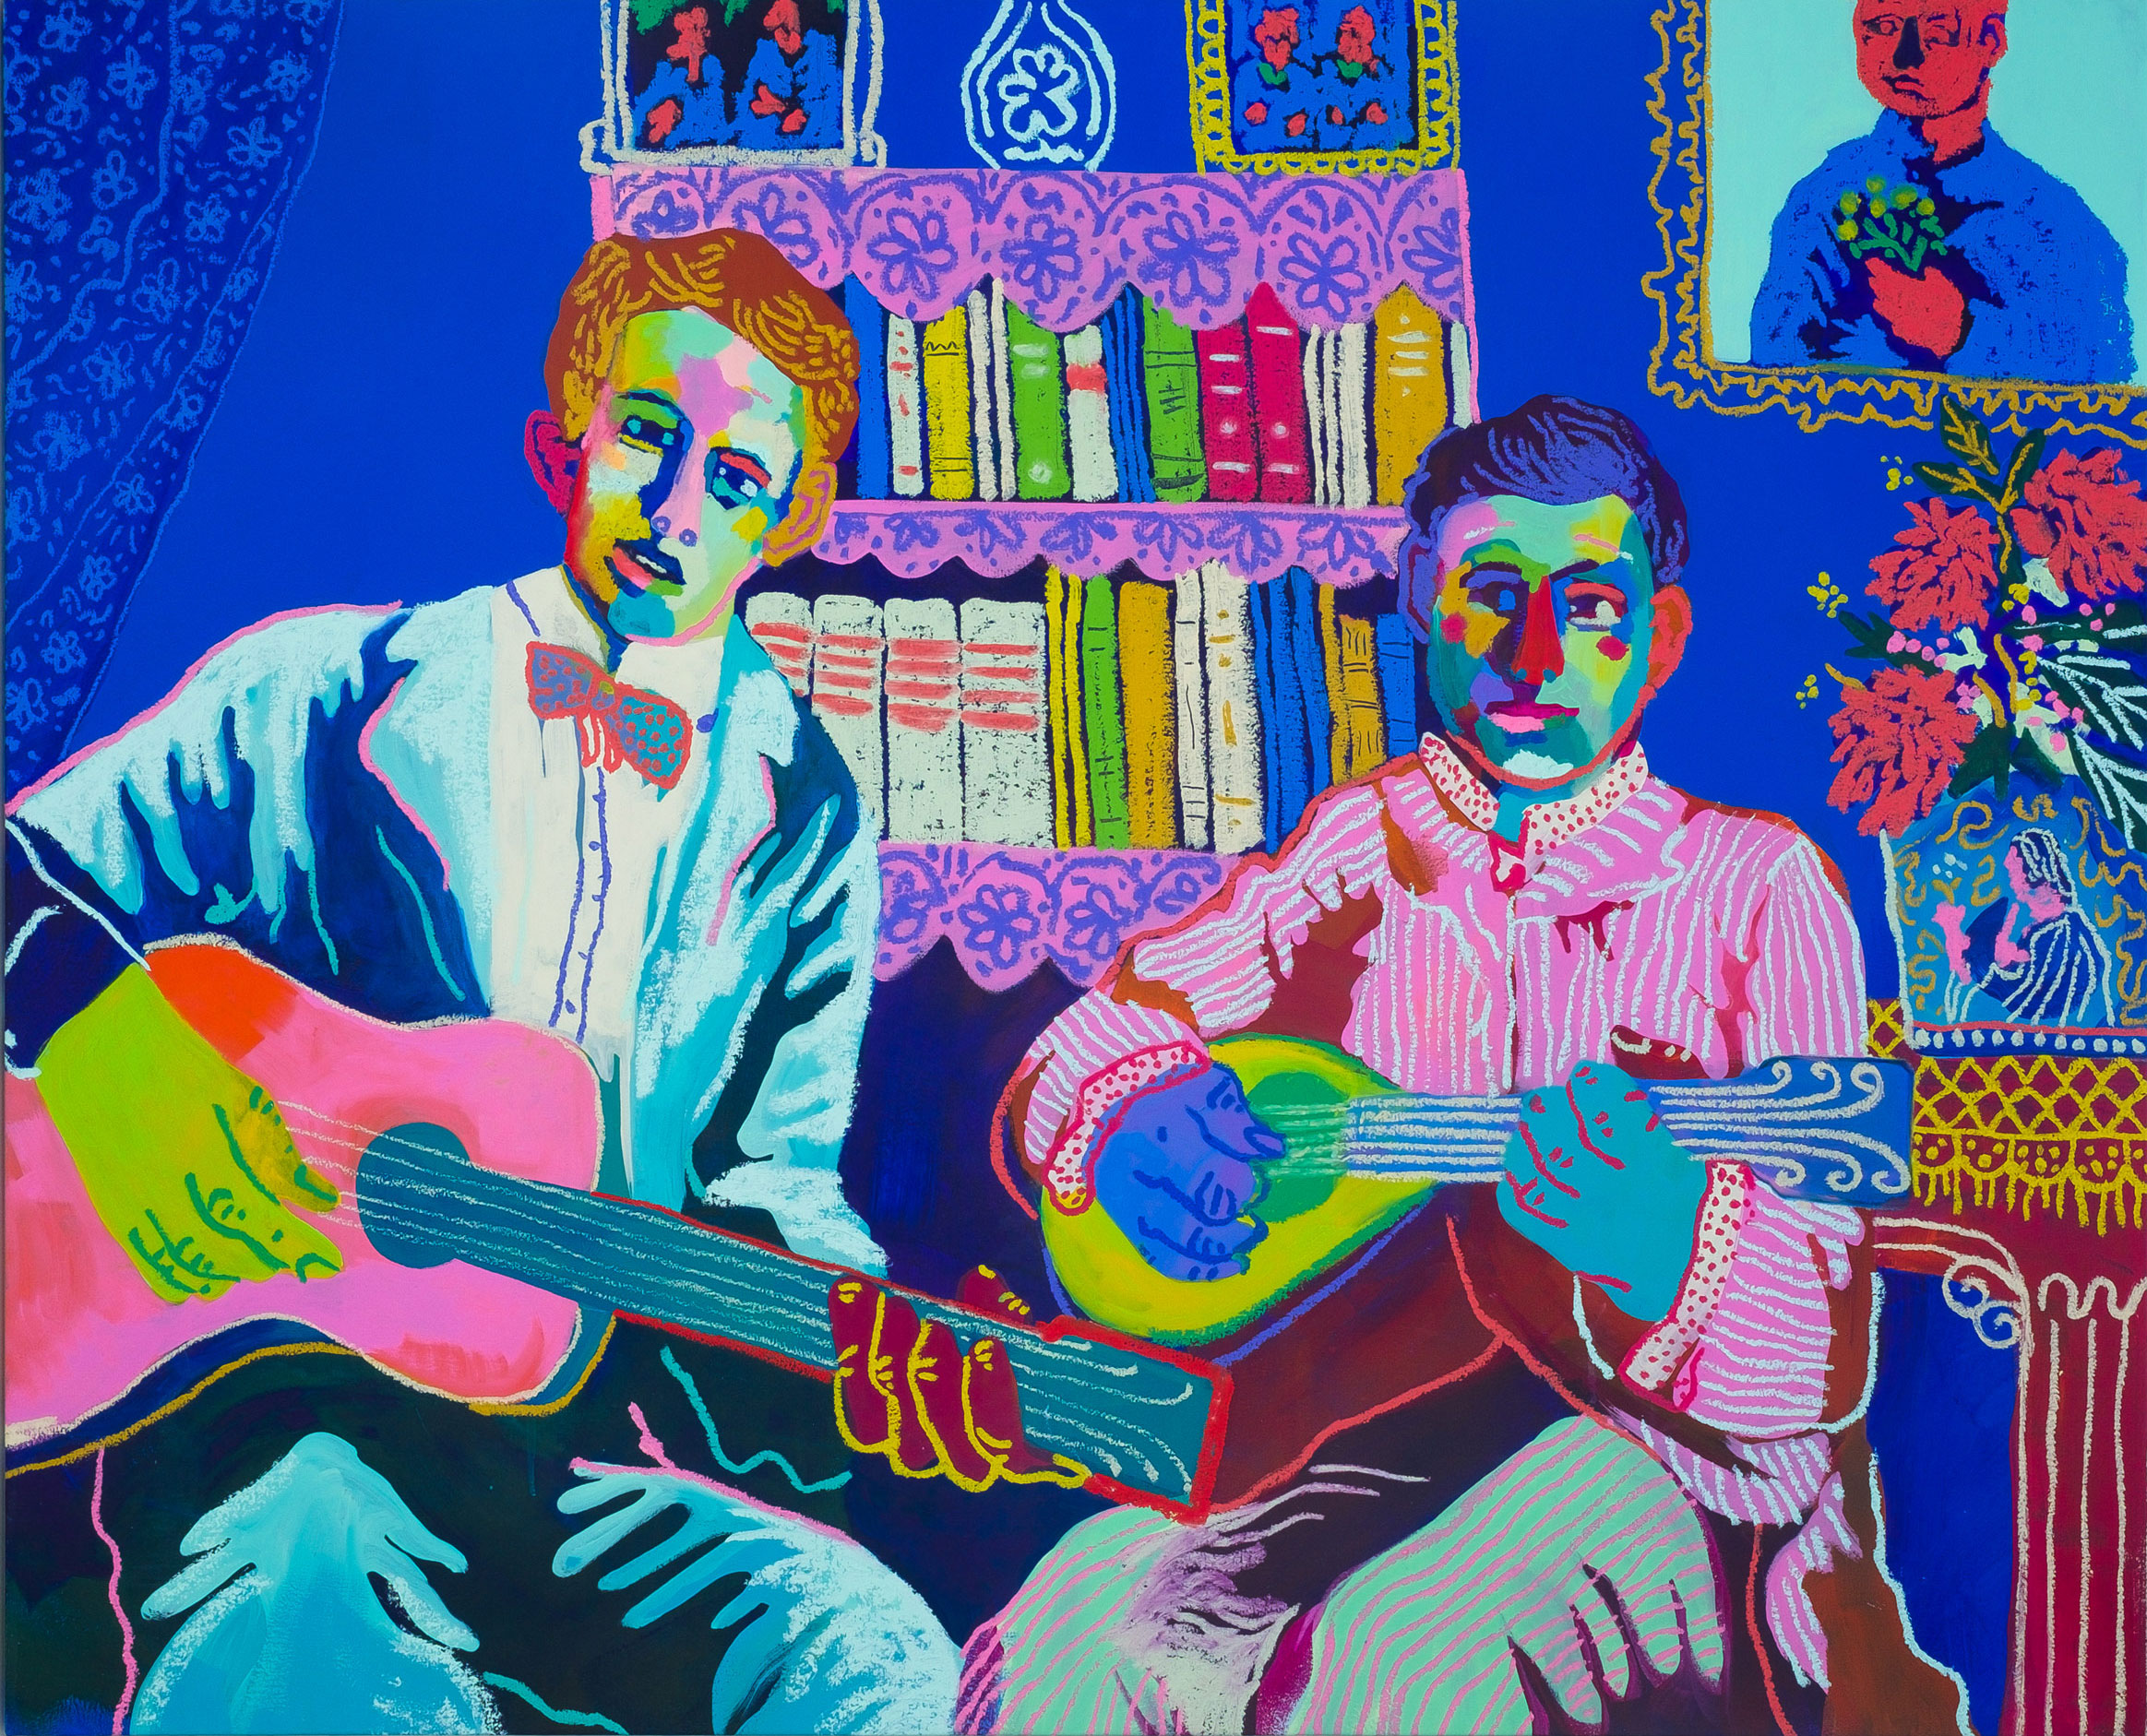 John-Kern-Holcomb-Blues-Brothers.jpg